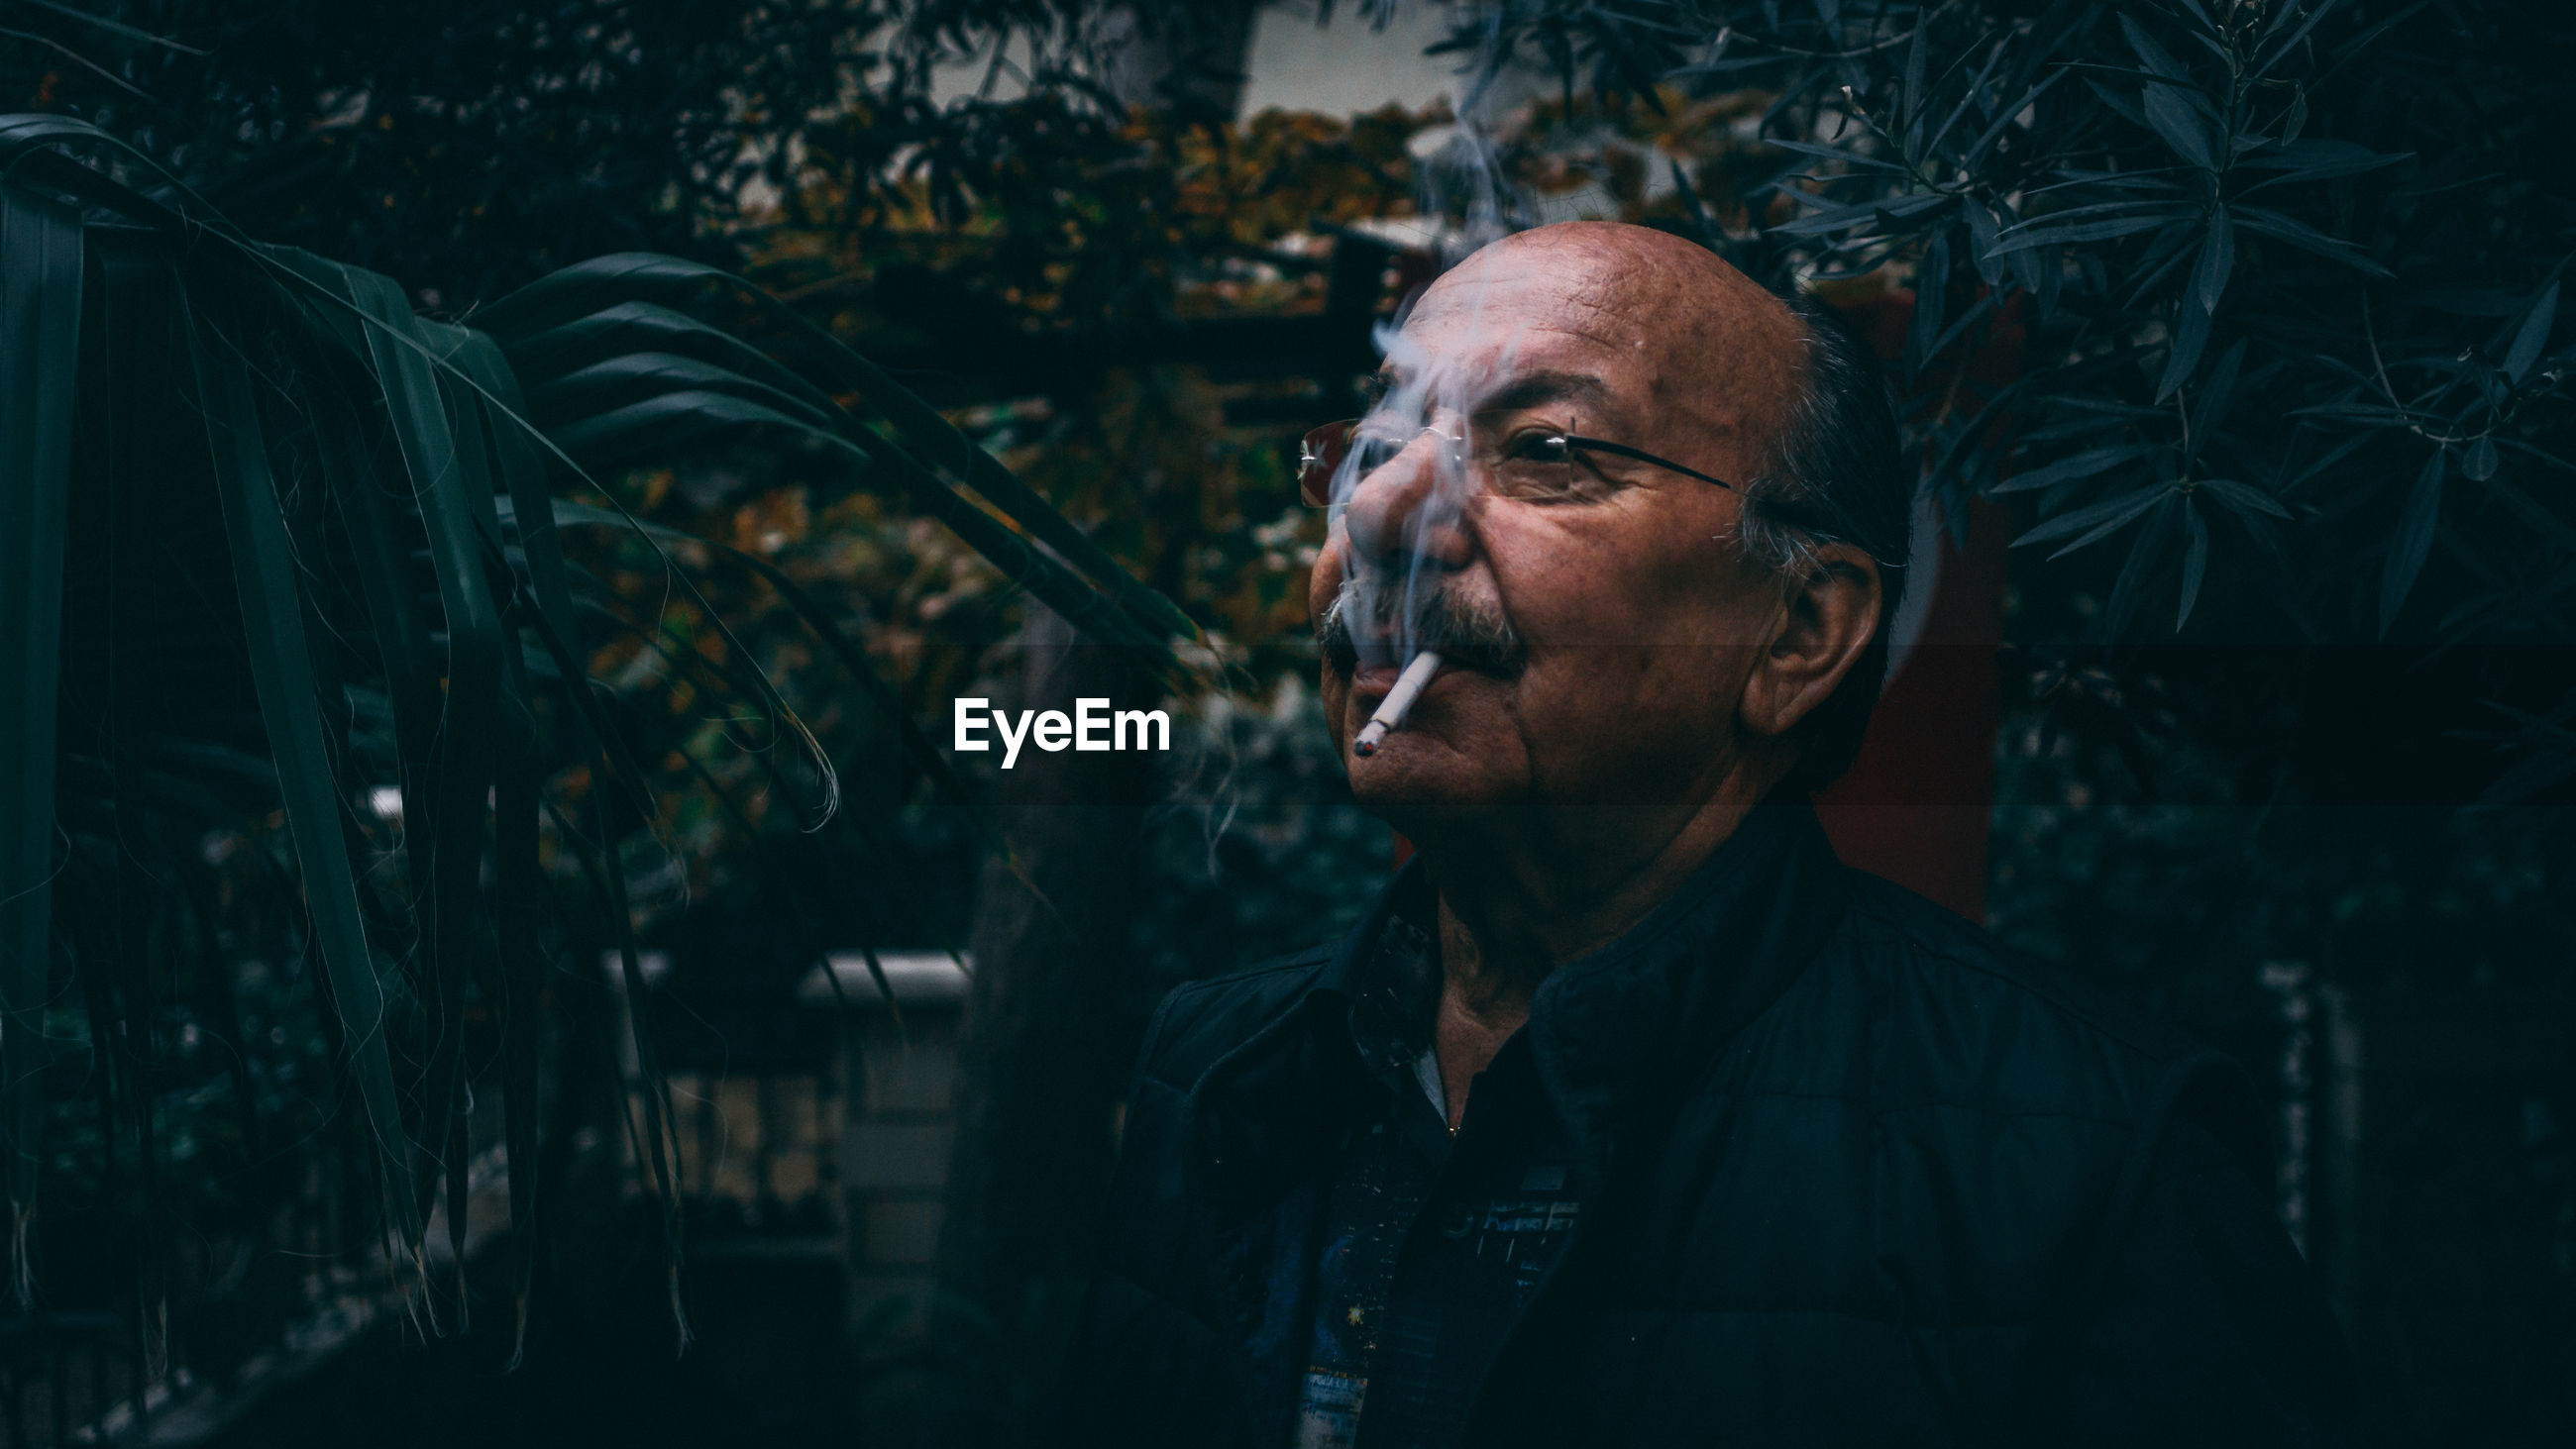 Man smoking cigarette against trees